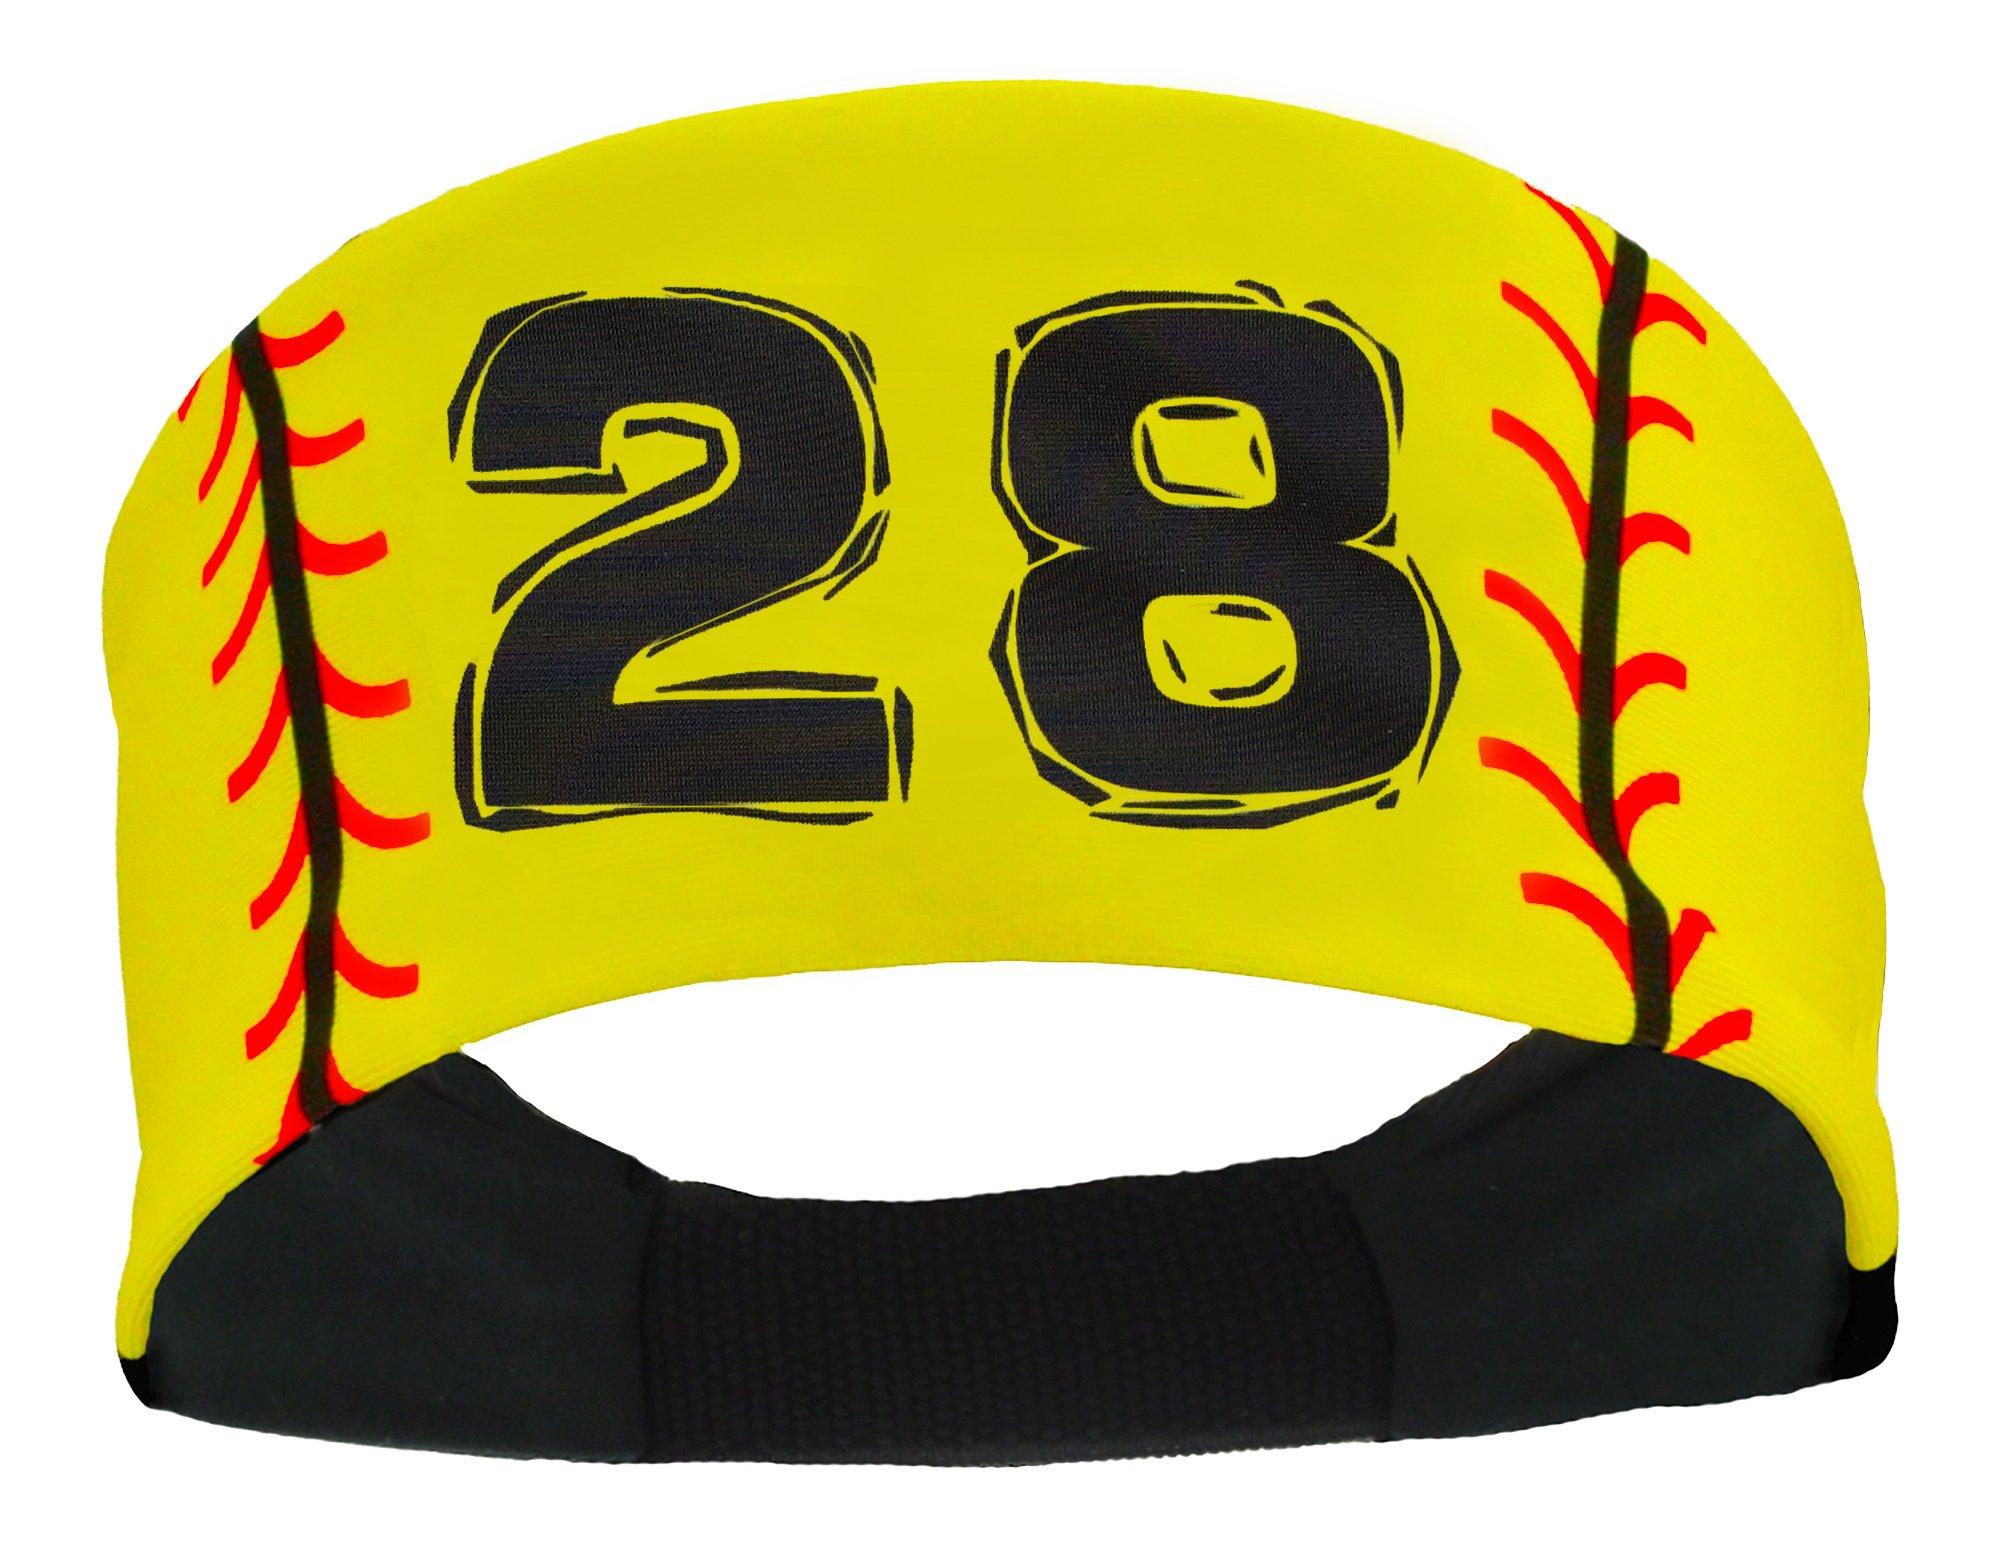 Player ID Softball Stitch Headband (numbers 0039